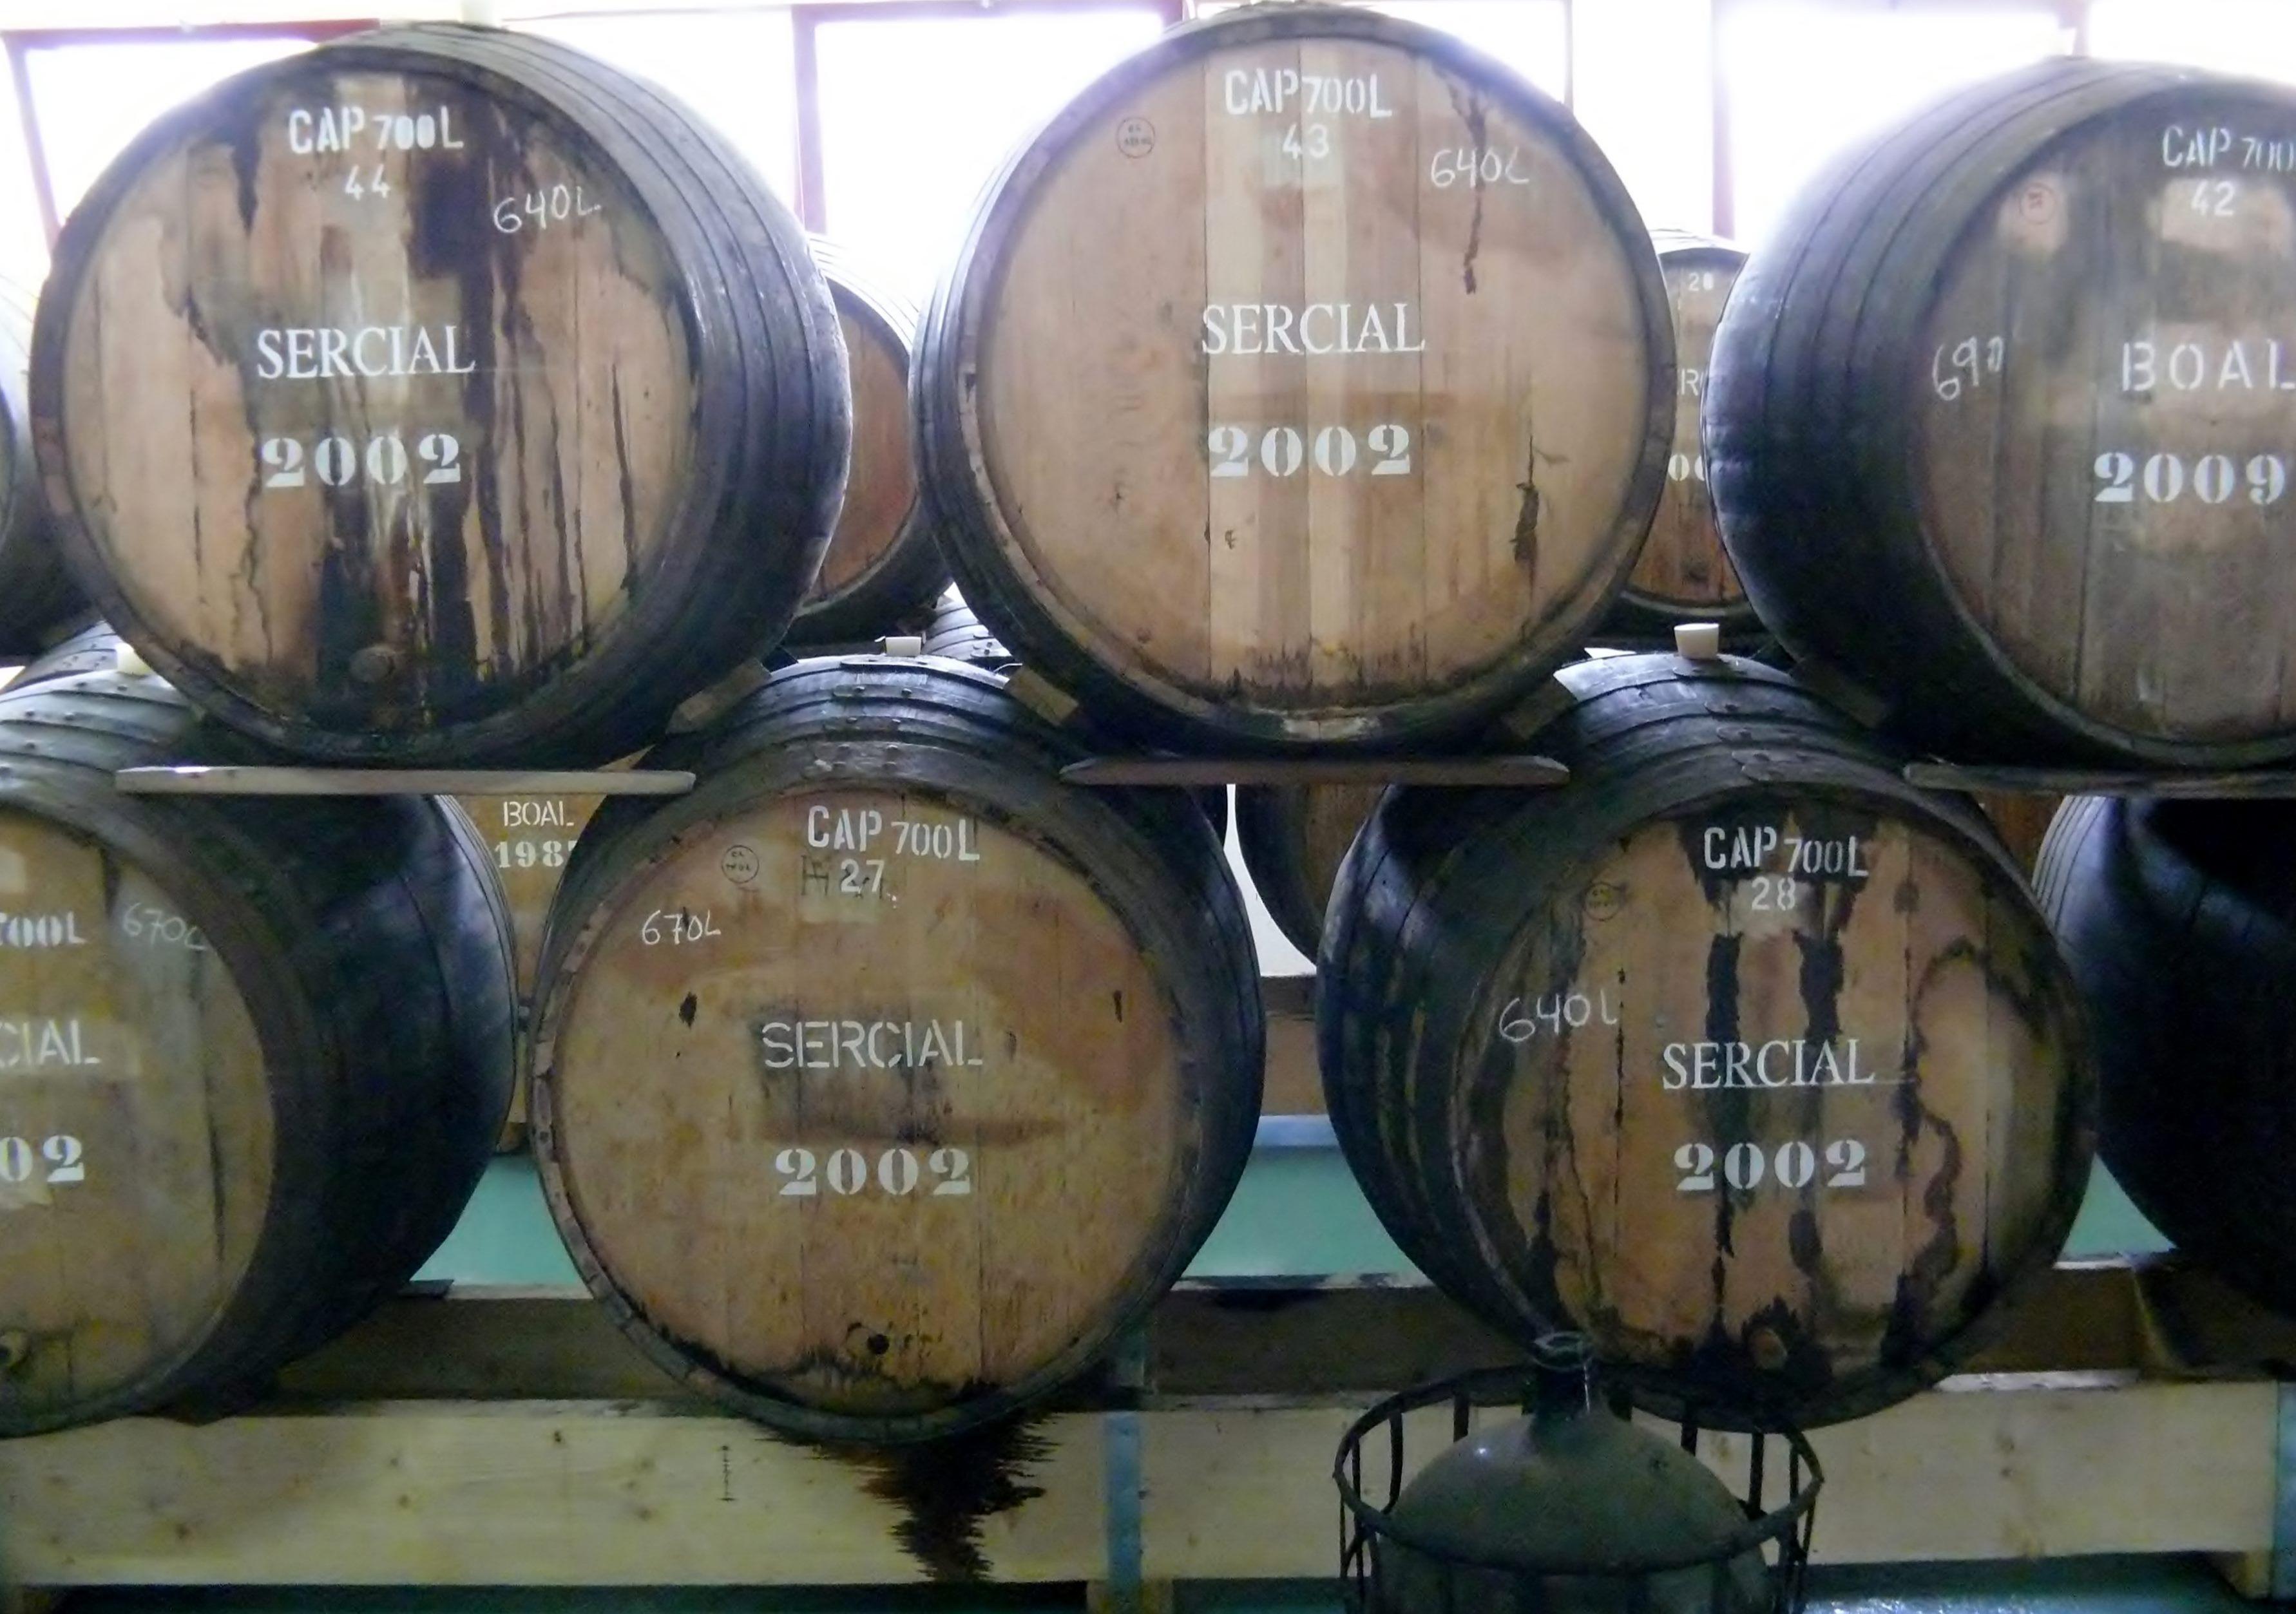 Sercial wines aging